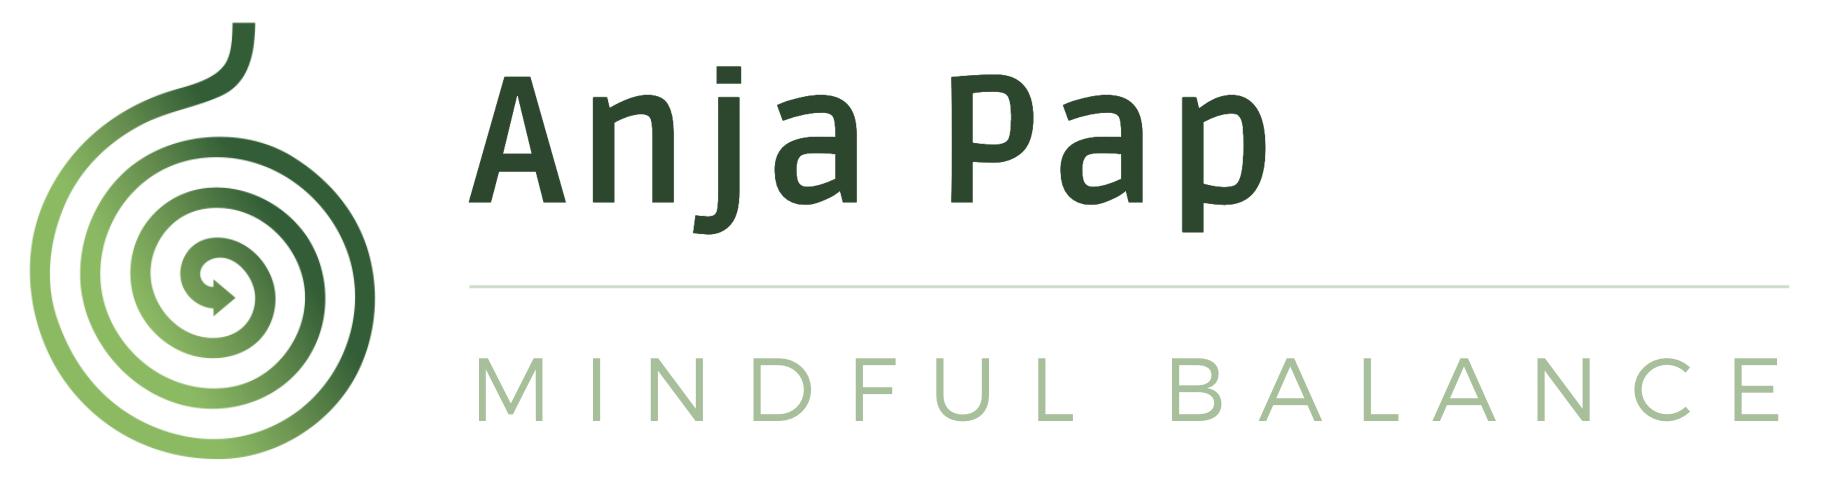 Anja Pap   Mindful Balance